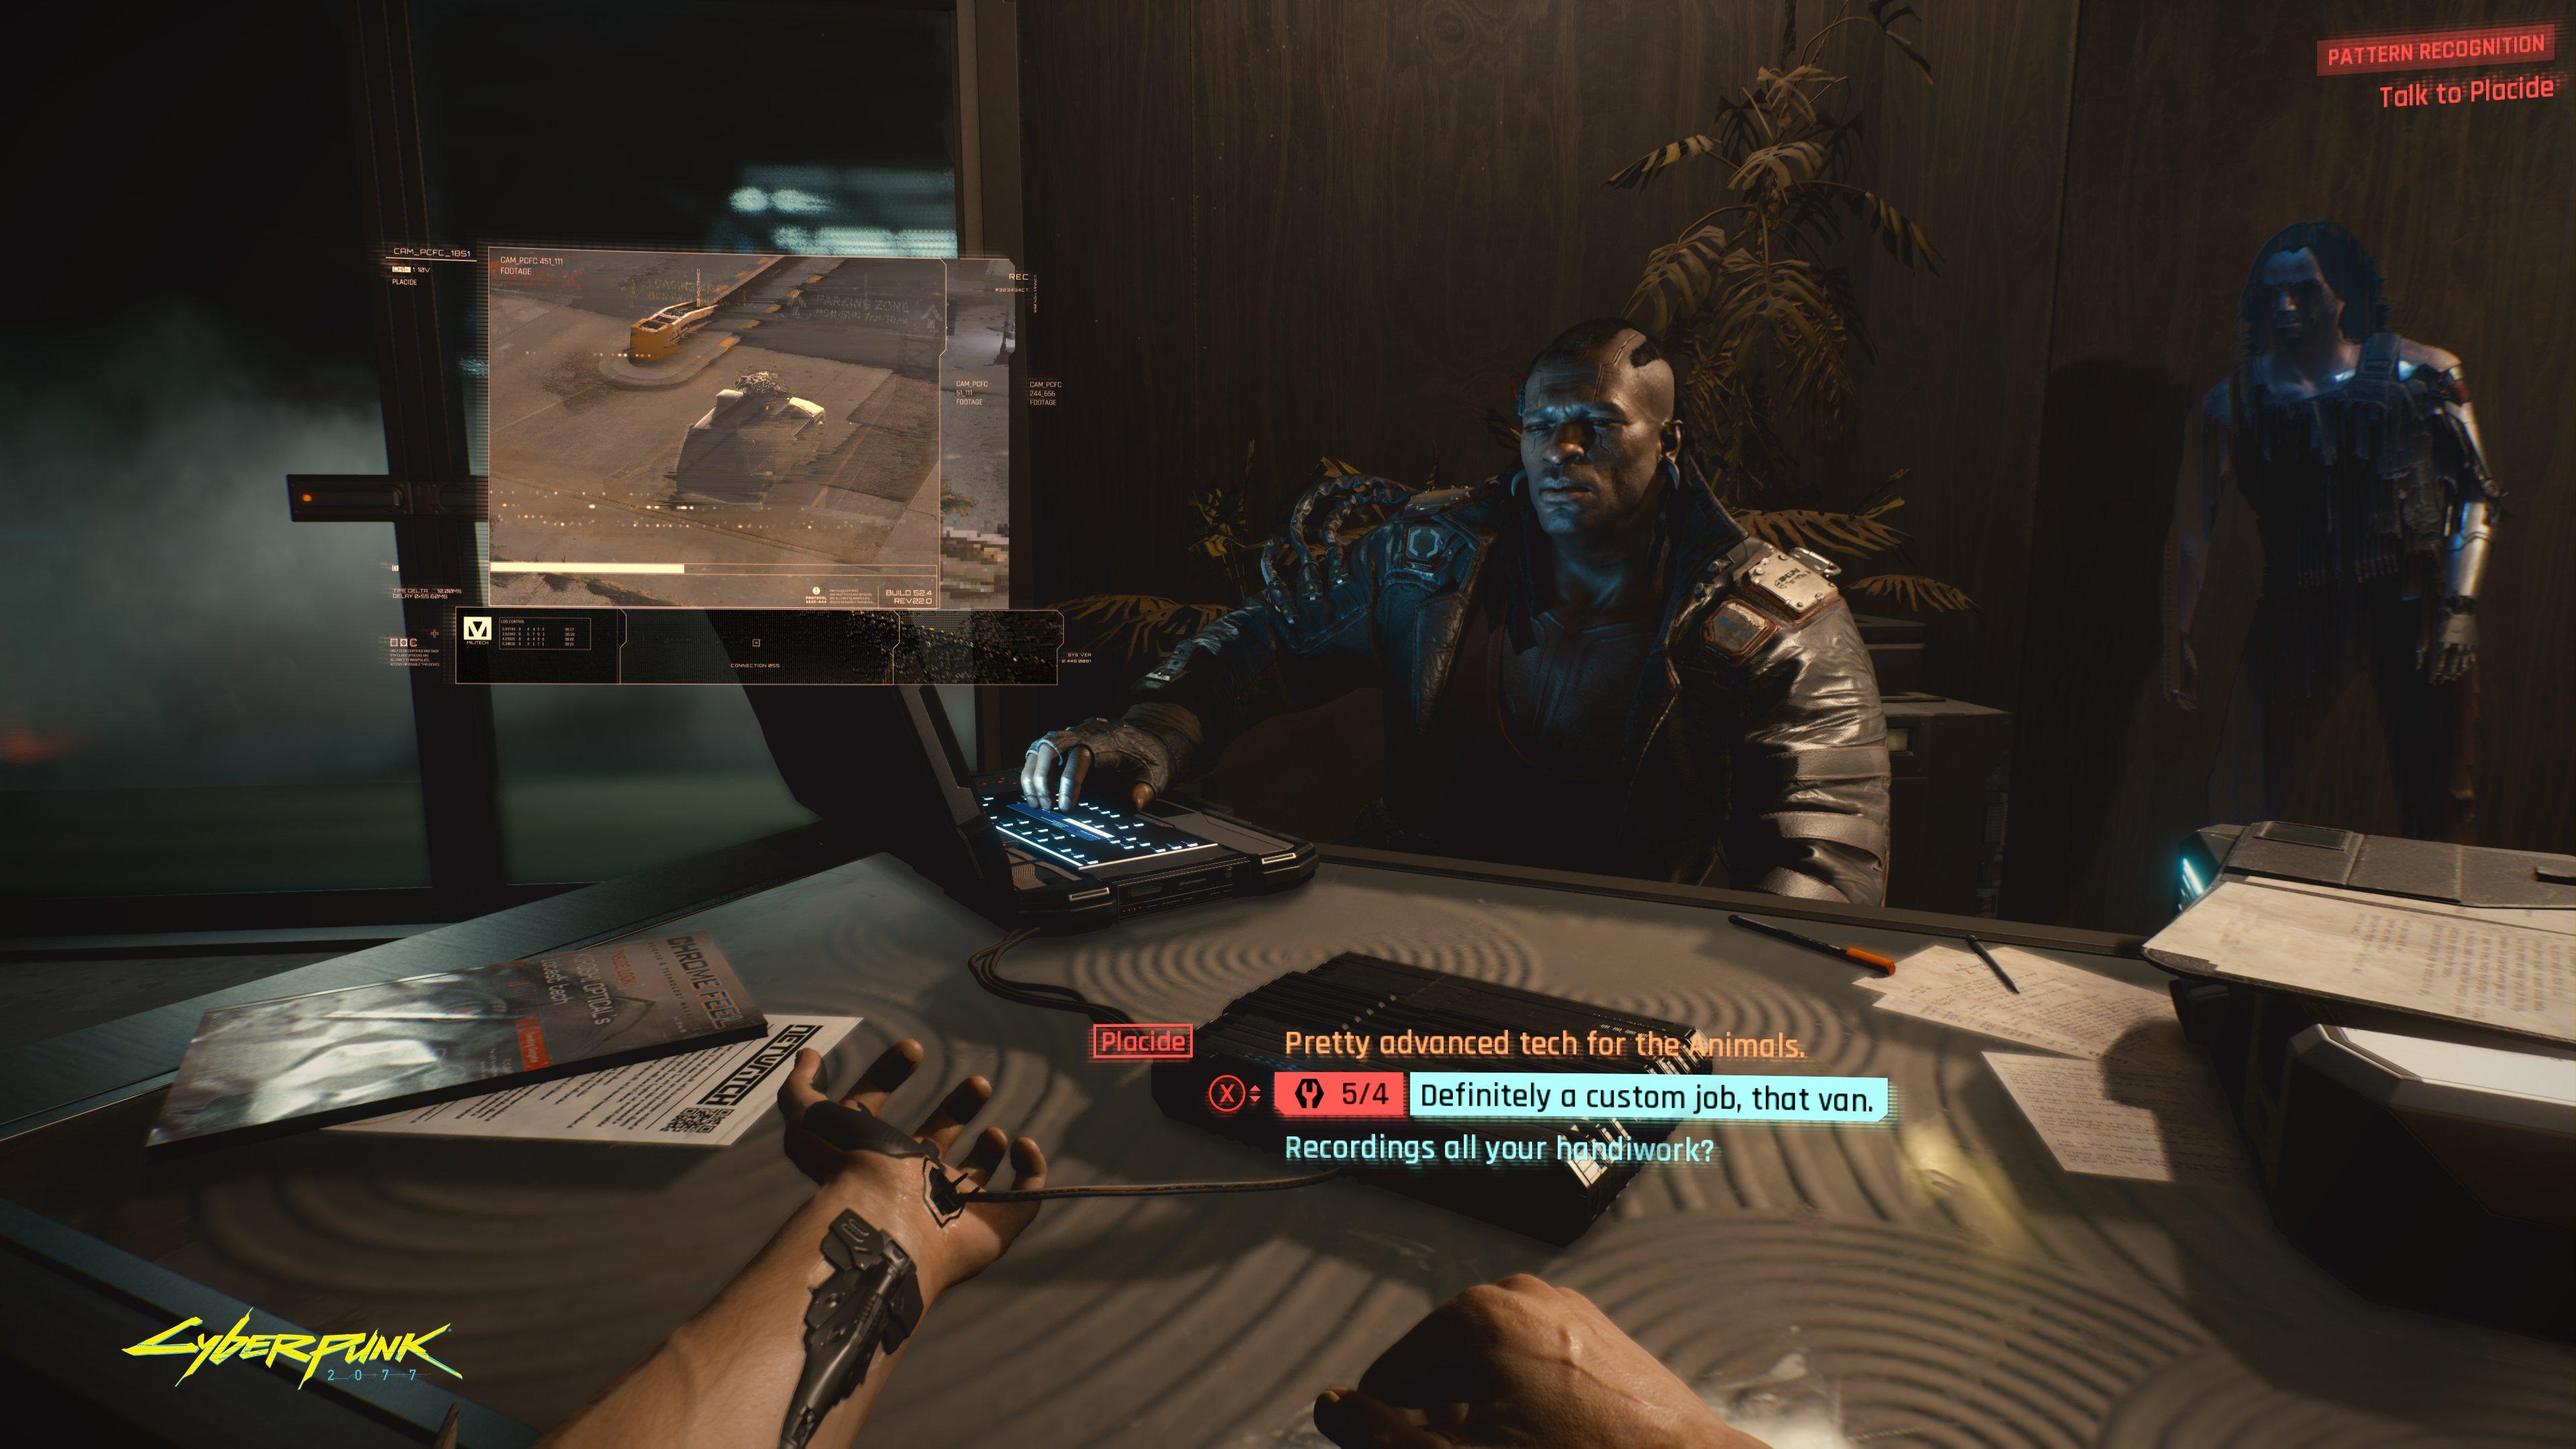 cyberpunk 2077 keanu reeves screen time